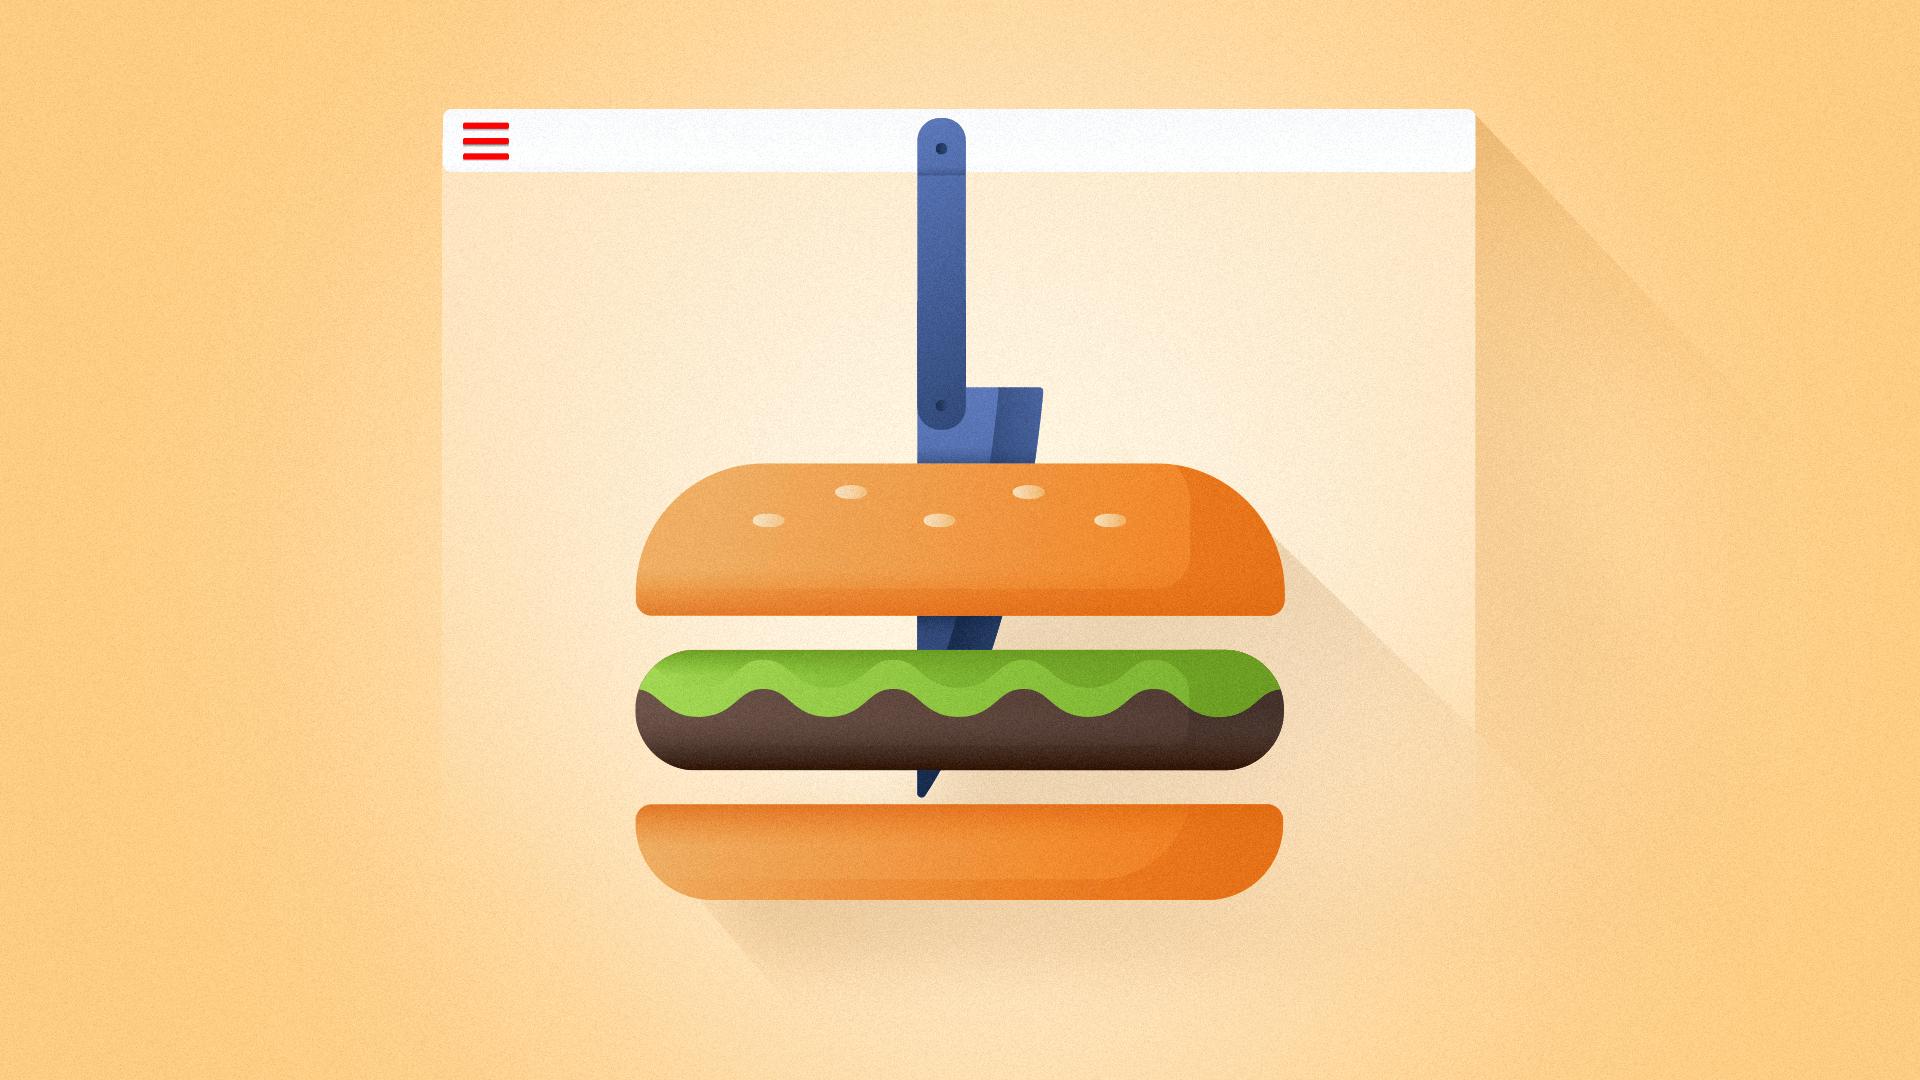 hamburger-menu-icon.jpg